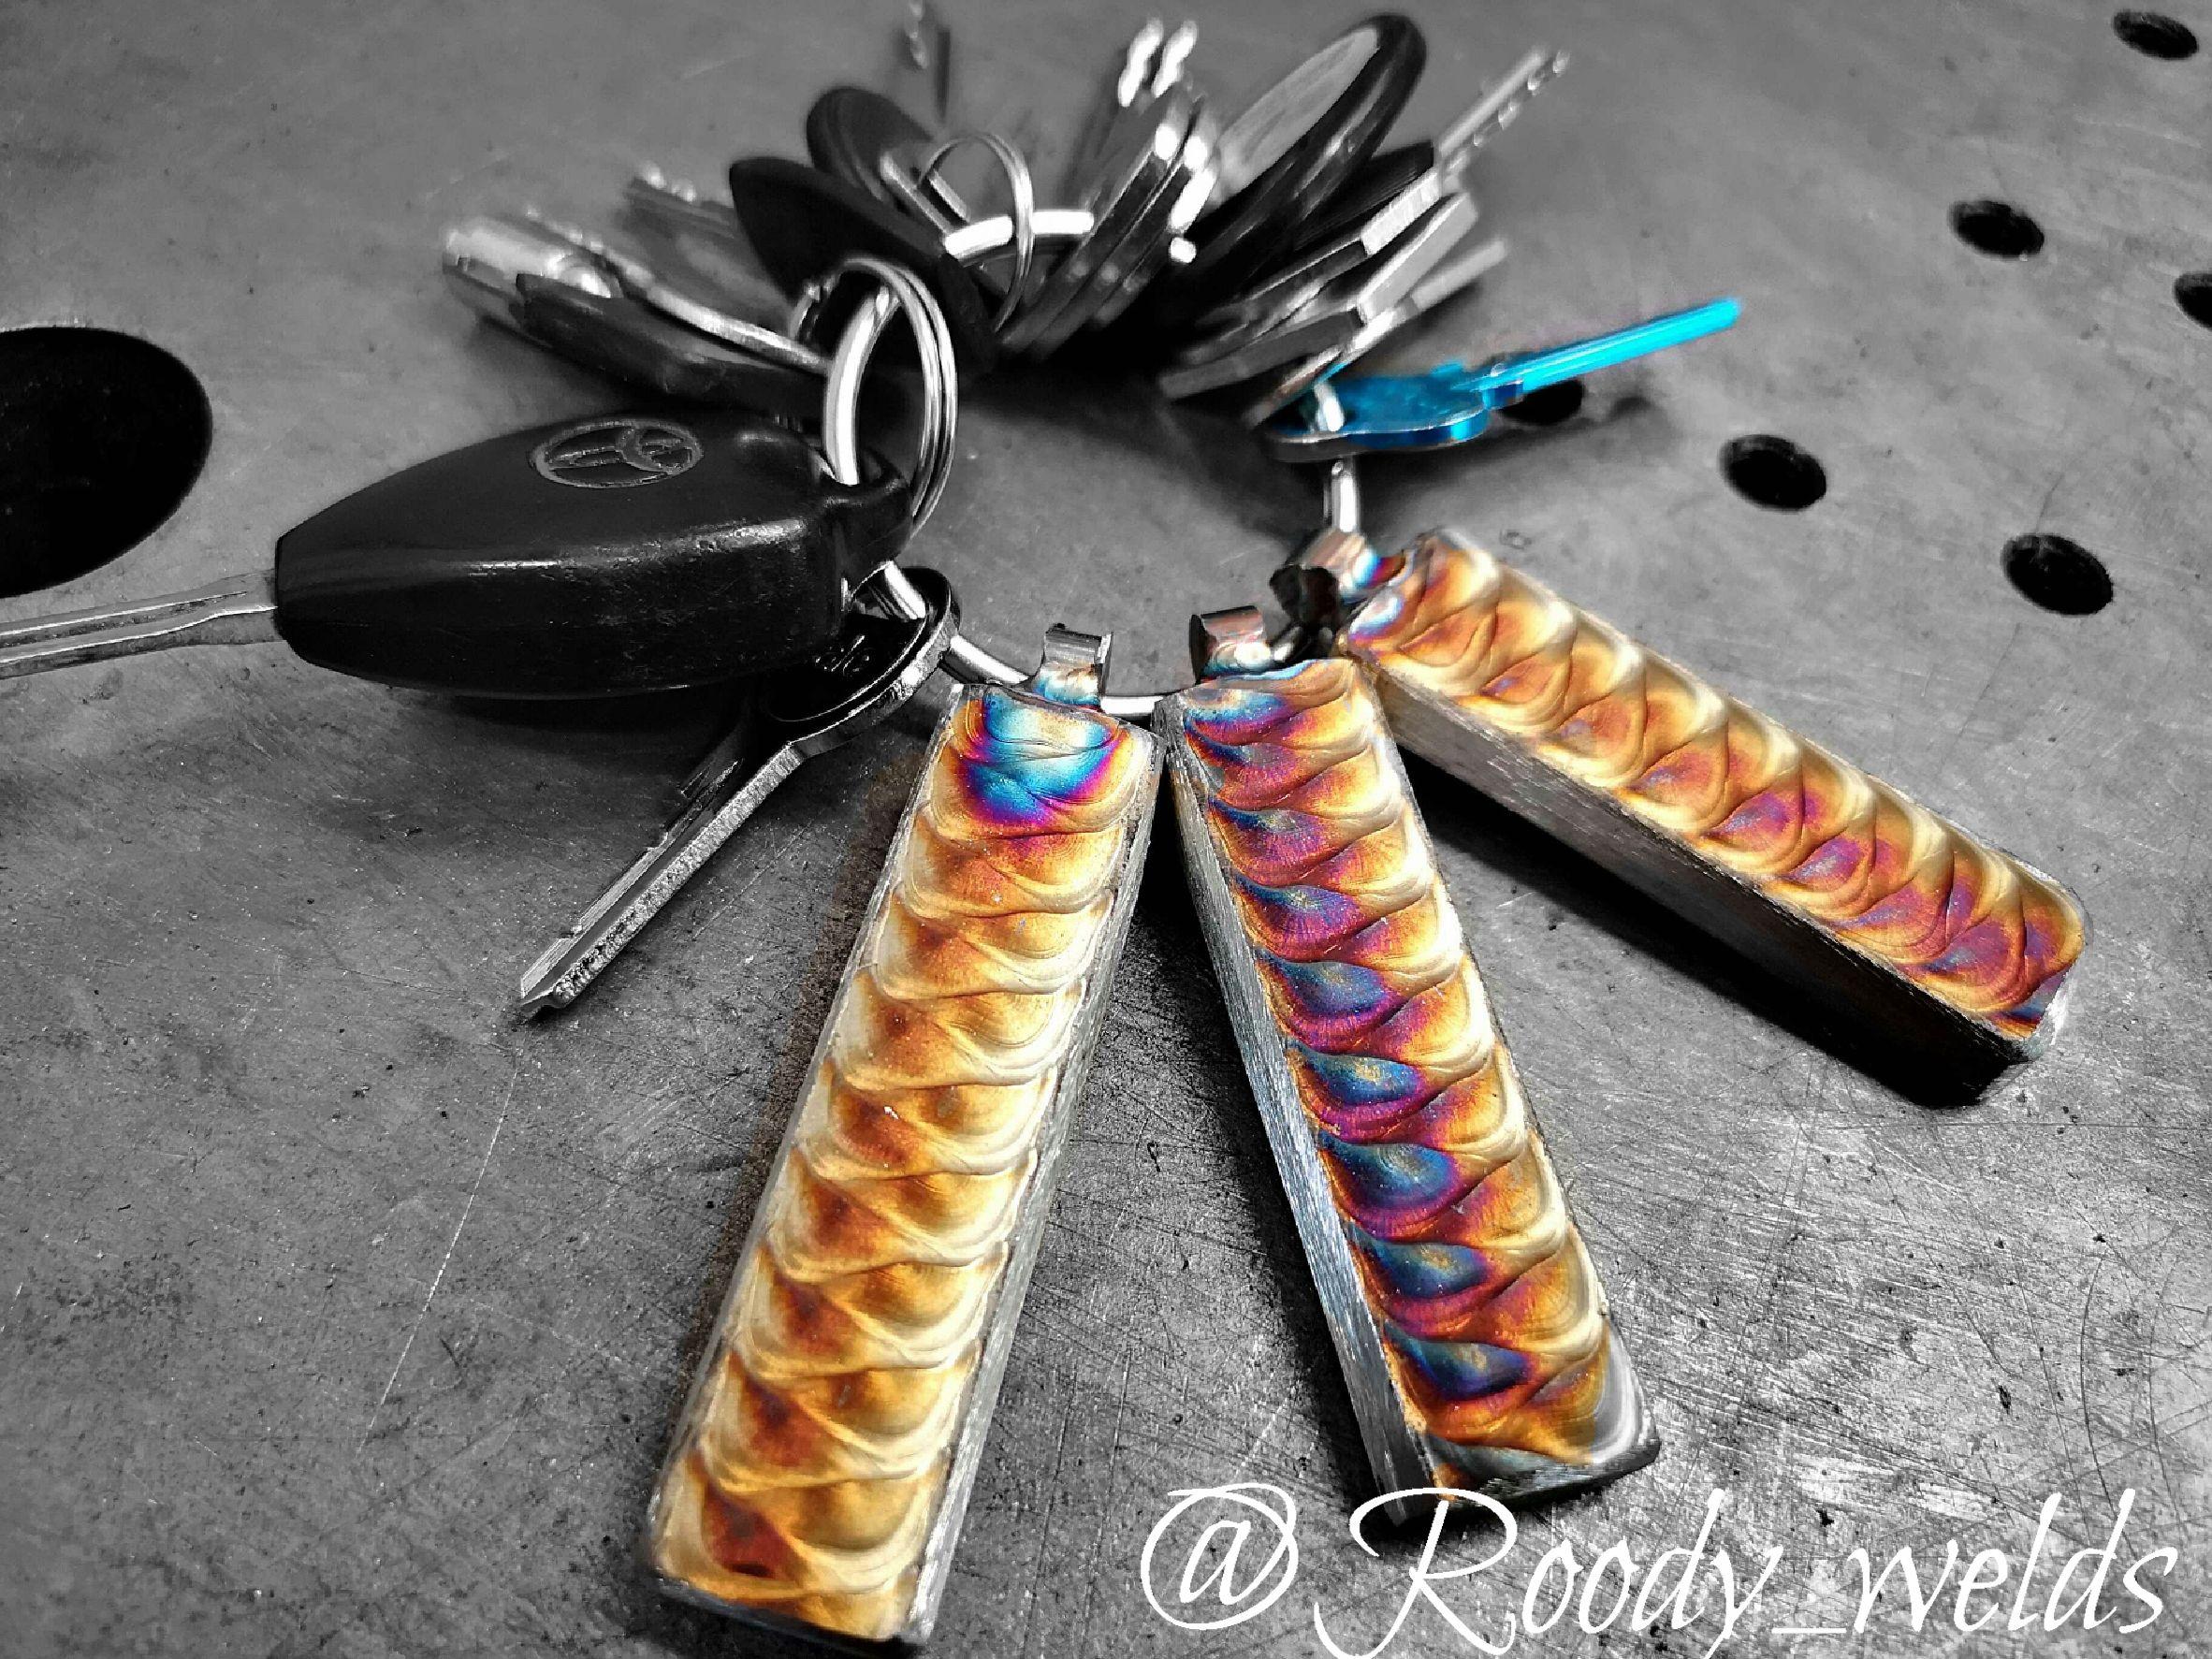 Stainless Steel Key Chains Welding Crafts Welding Art Welding Art Projects